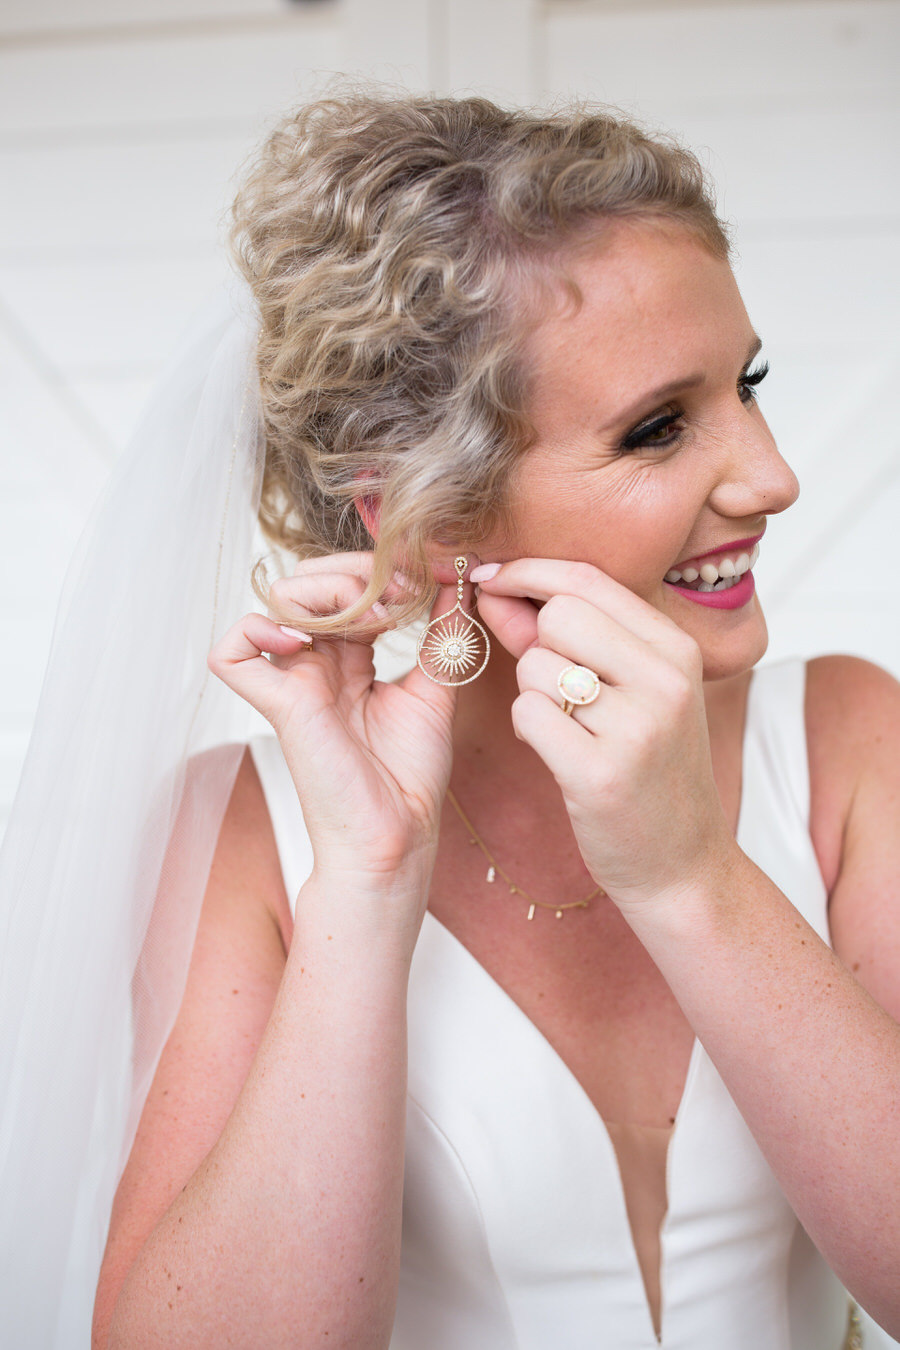 New Braunfels Texas bride putting on earrings